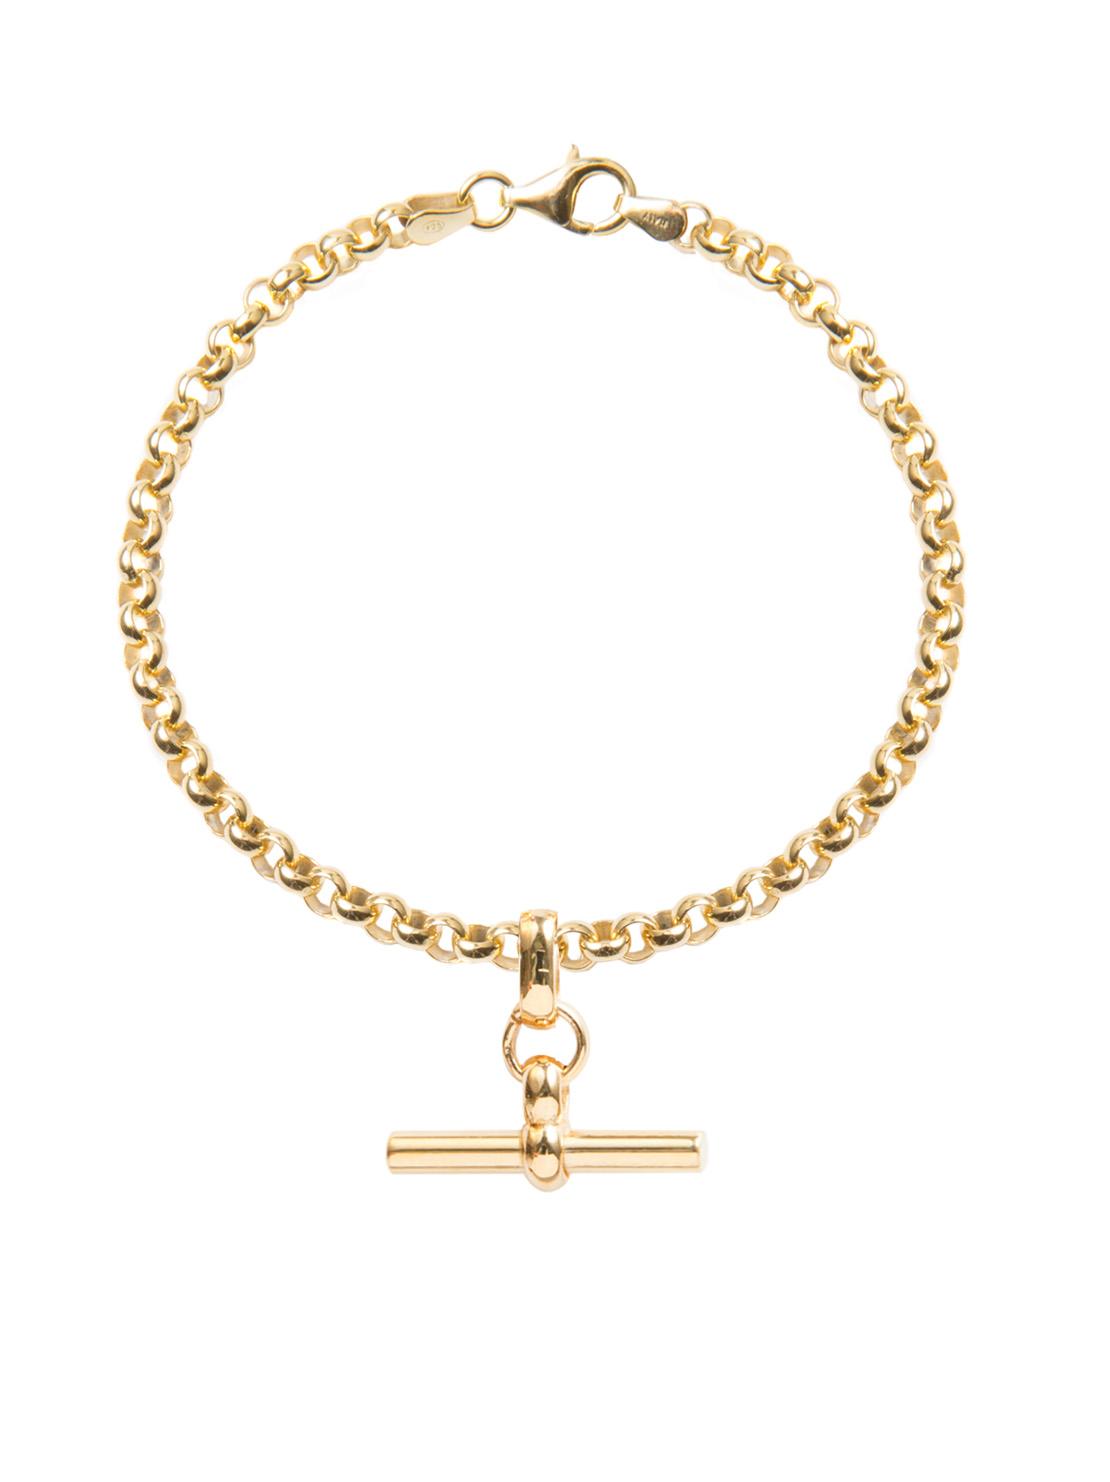 dc1fe81f9 Gold Belcher Bracelet With Gold T-Bar - Tilly Sveaas Jewellery